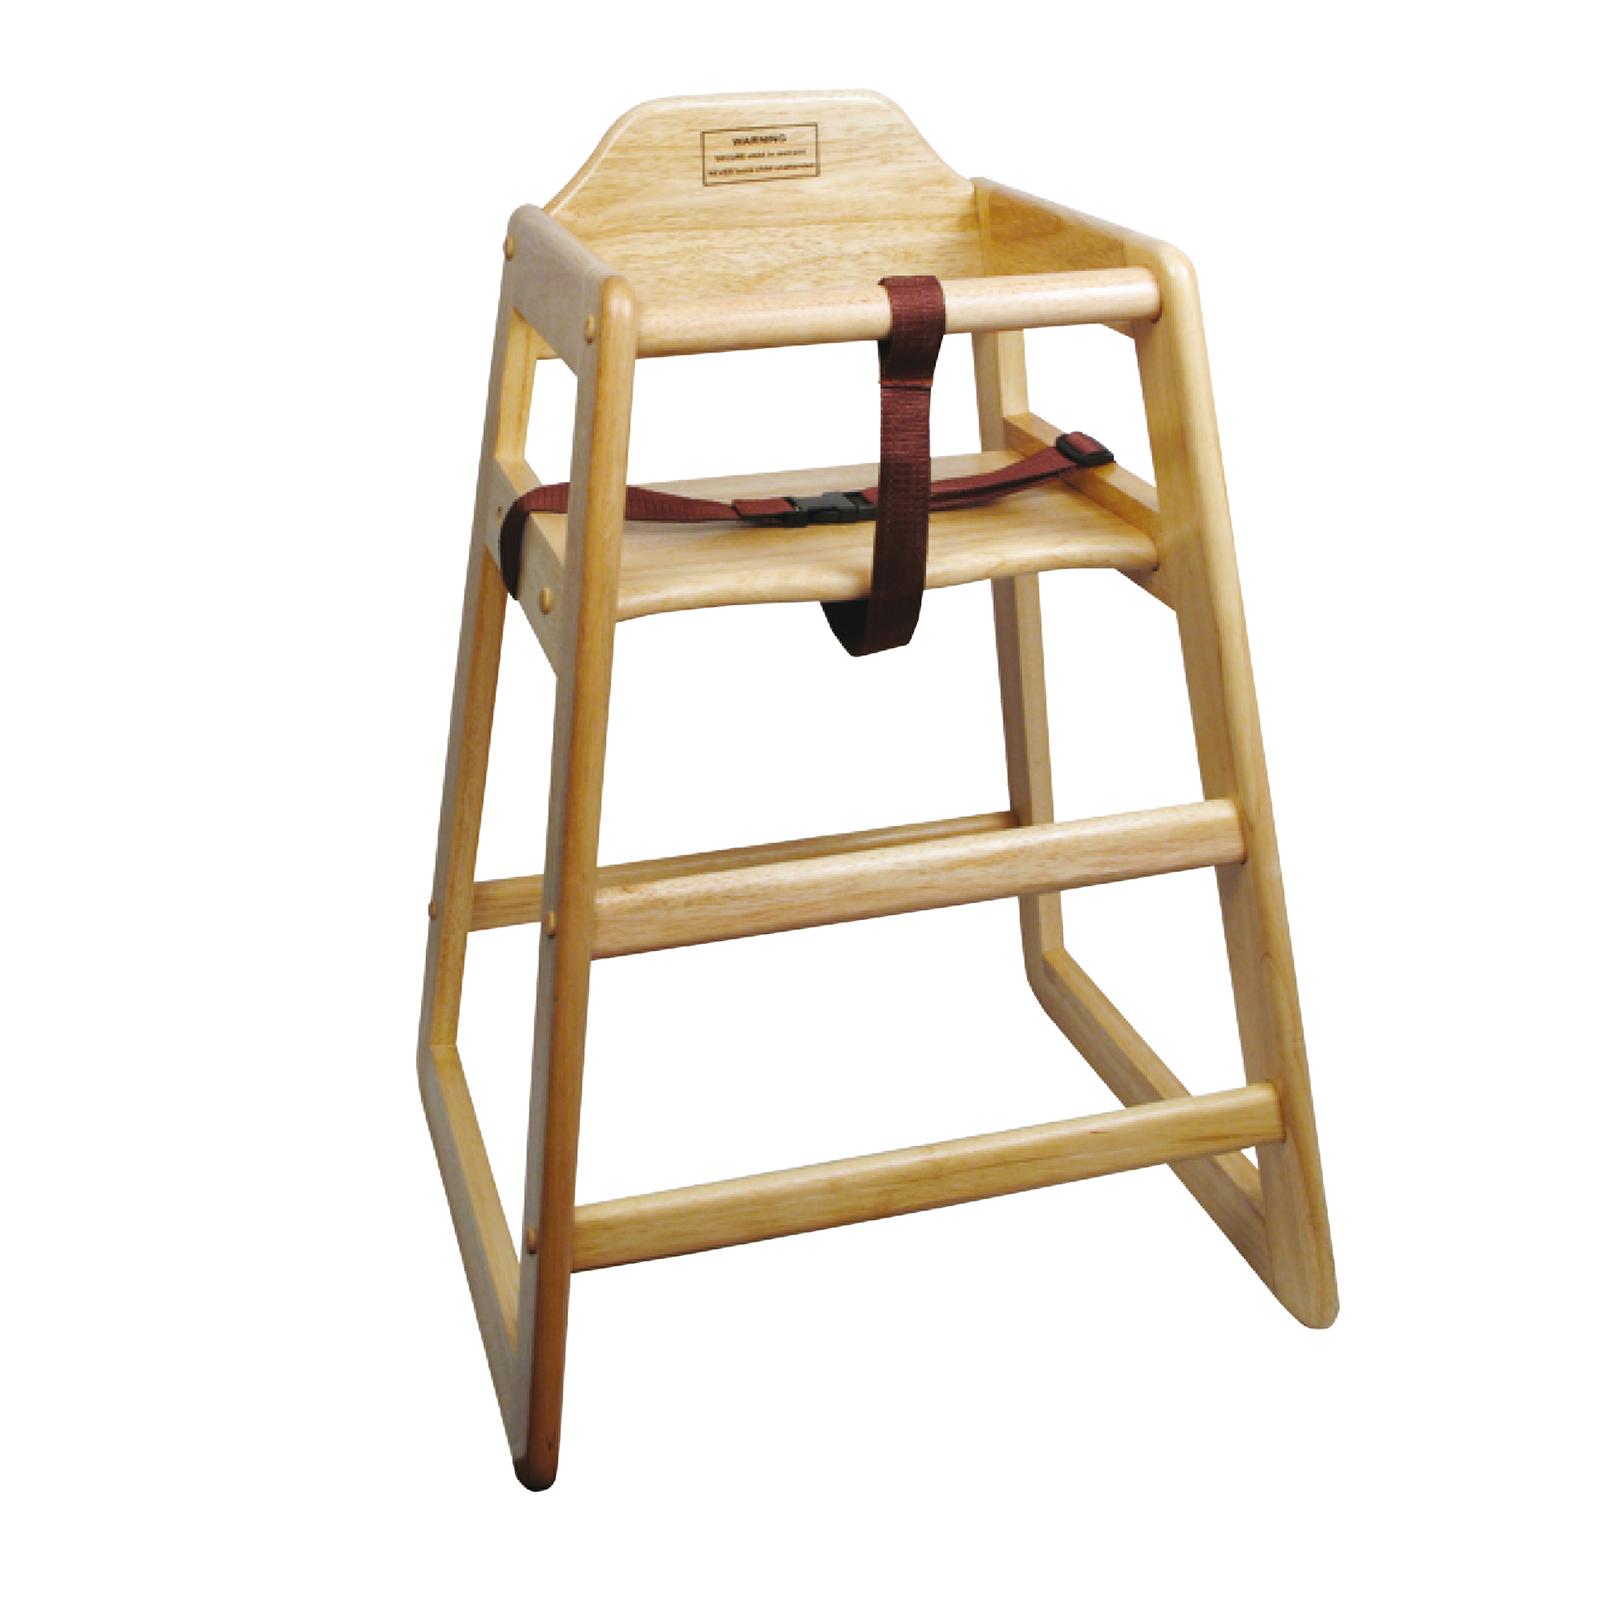 Natural Finish Wood High Chair, Winco CHH-101A